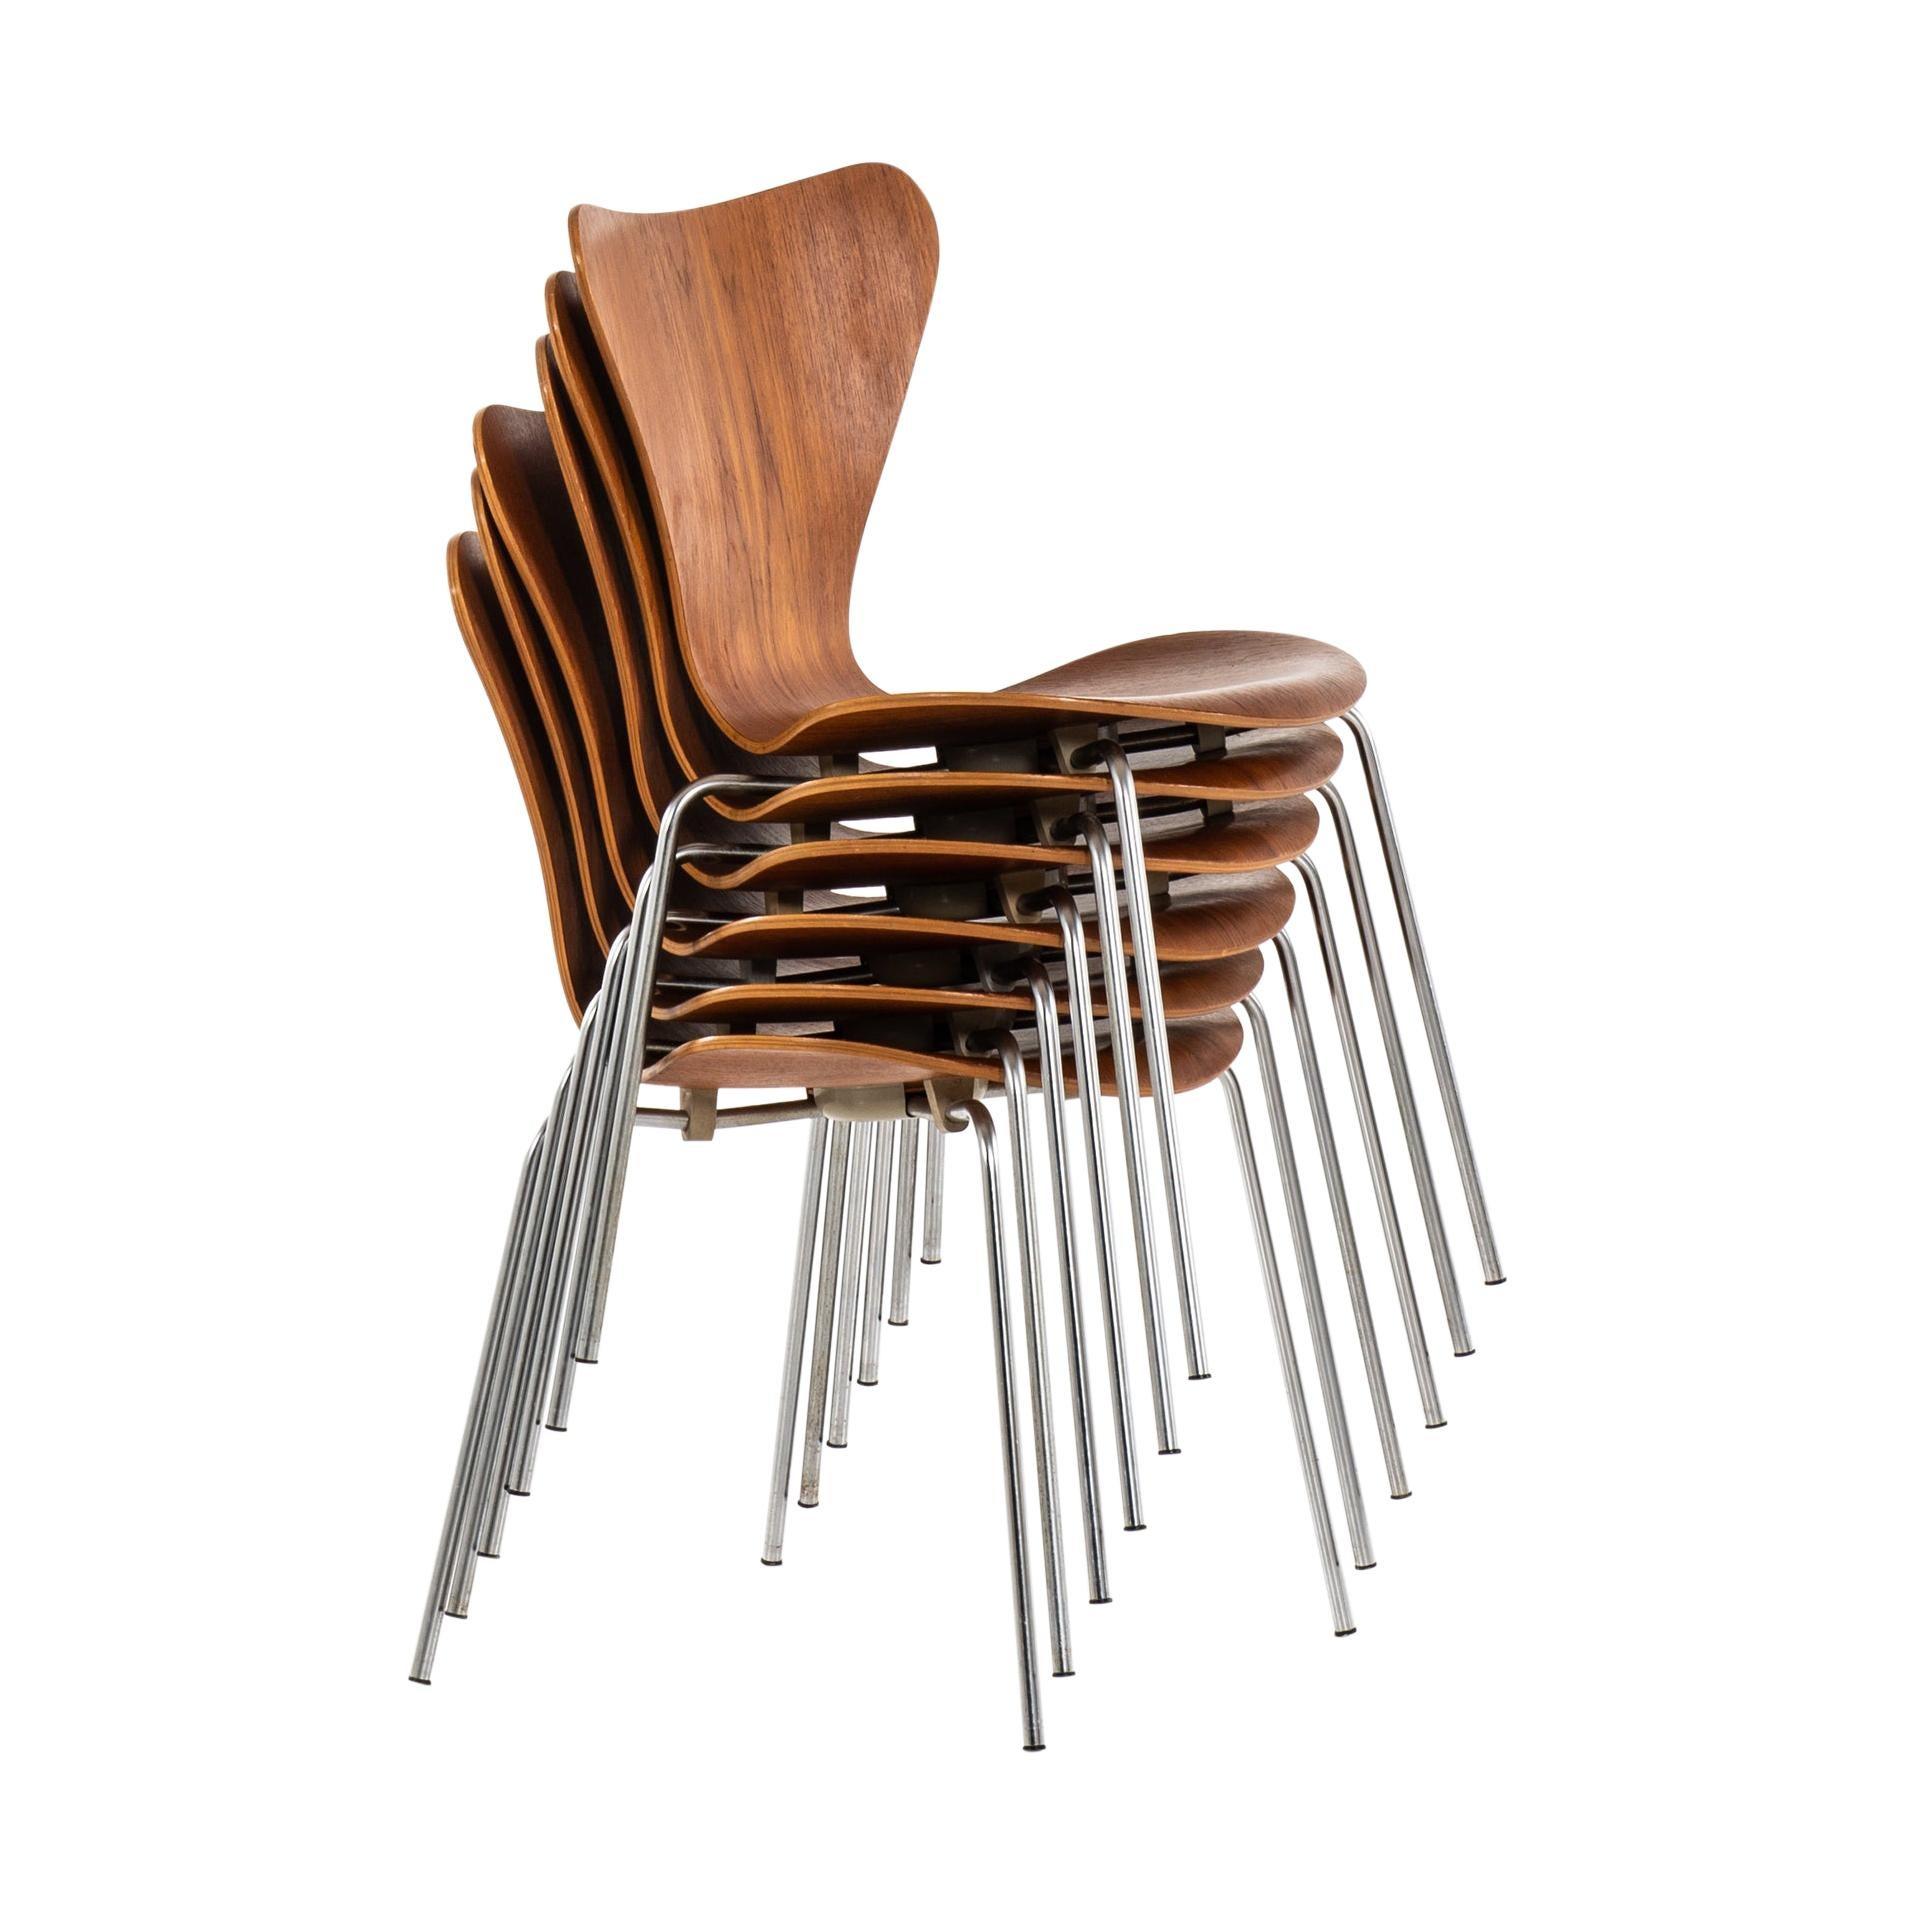 Arne Jacobsen Dining Chairs Model 3107 / Seven Series by Fritz Hansen in Denmark